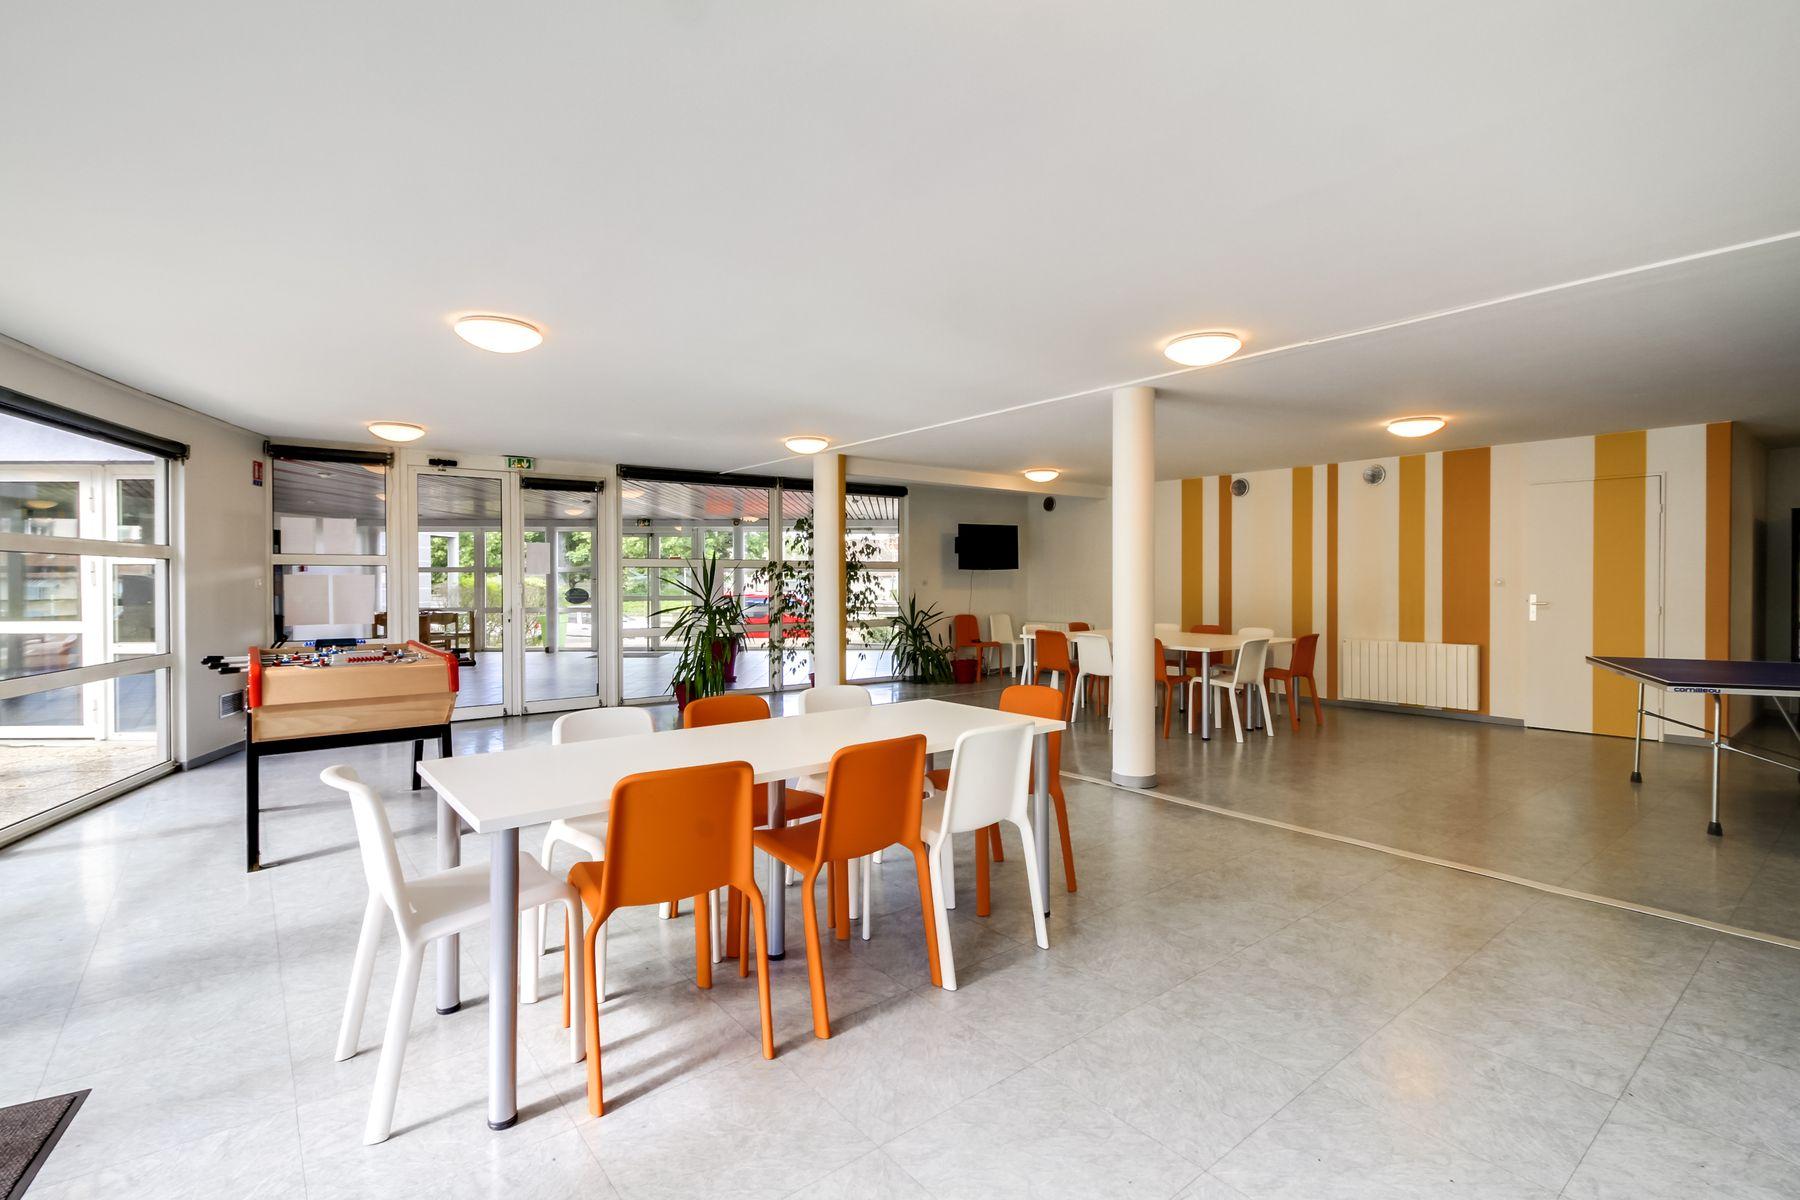 LOGIFAC résidence étudiante Saint-Exupéry Dijon co-working